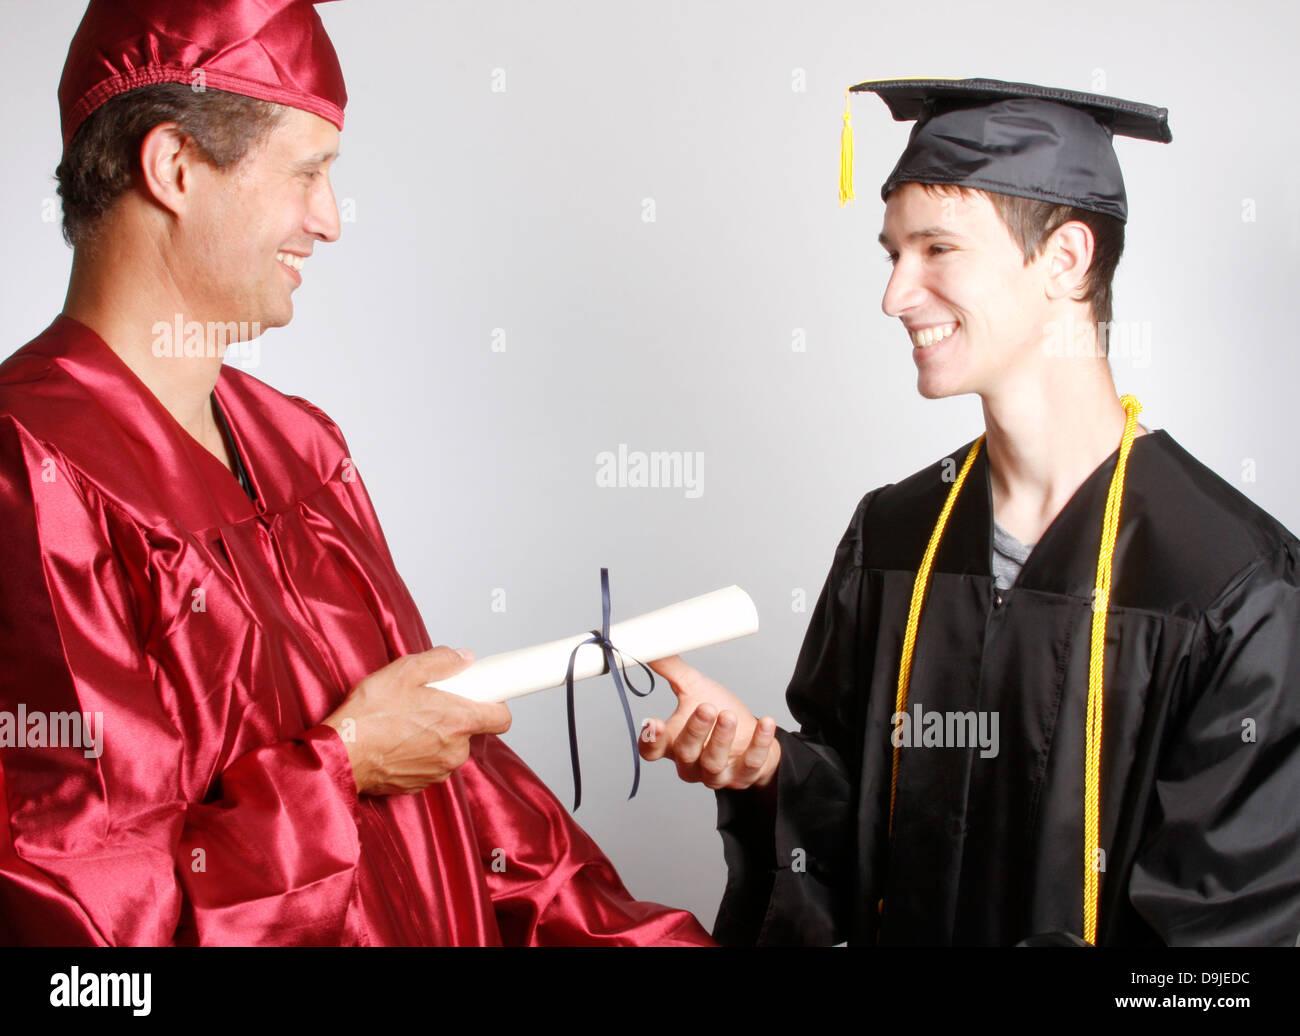 A Dean handing a graduate a diploma - Stock Image